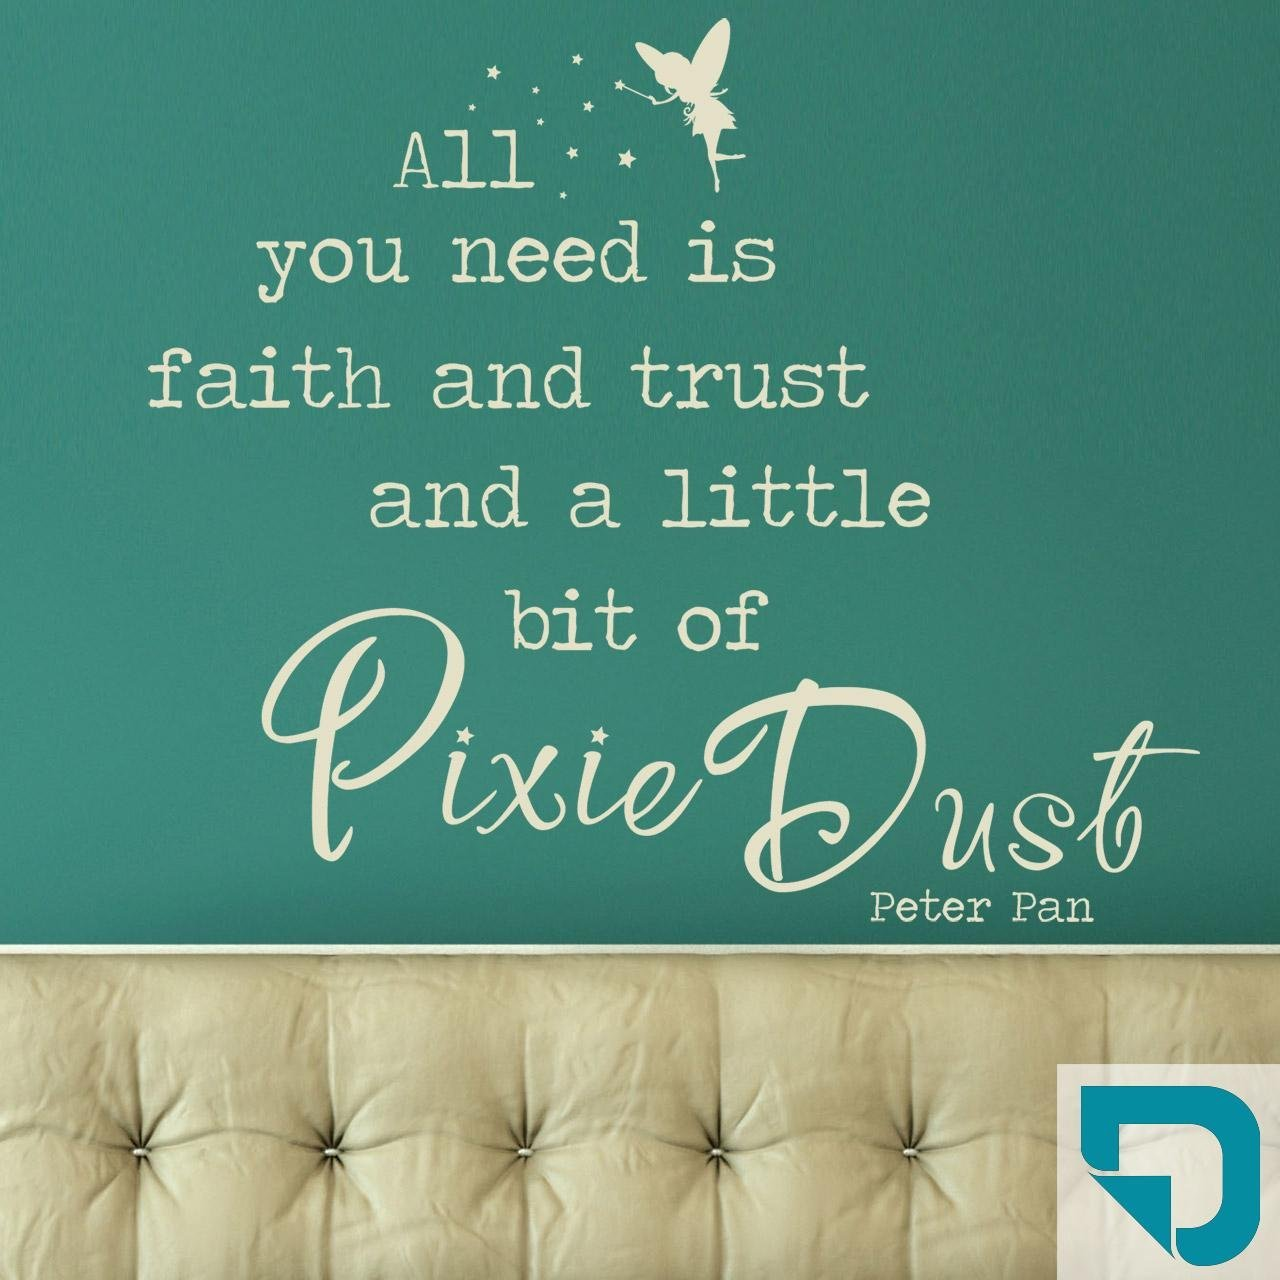 DESIGNSCAPE® Wandtattoo All All All you need is faith and trust an a little bit of Pixie Dust - Peter Pan Zitat 90 x 77 cm (Breite x Höhe) braun DW802125-M-F9 B01FSB67FM Wandtattoos & Wandbilder 2c5bac